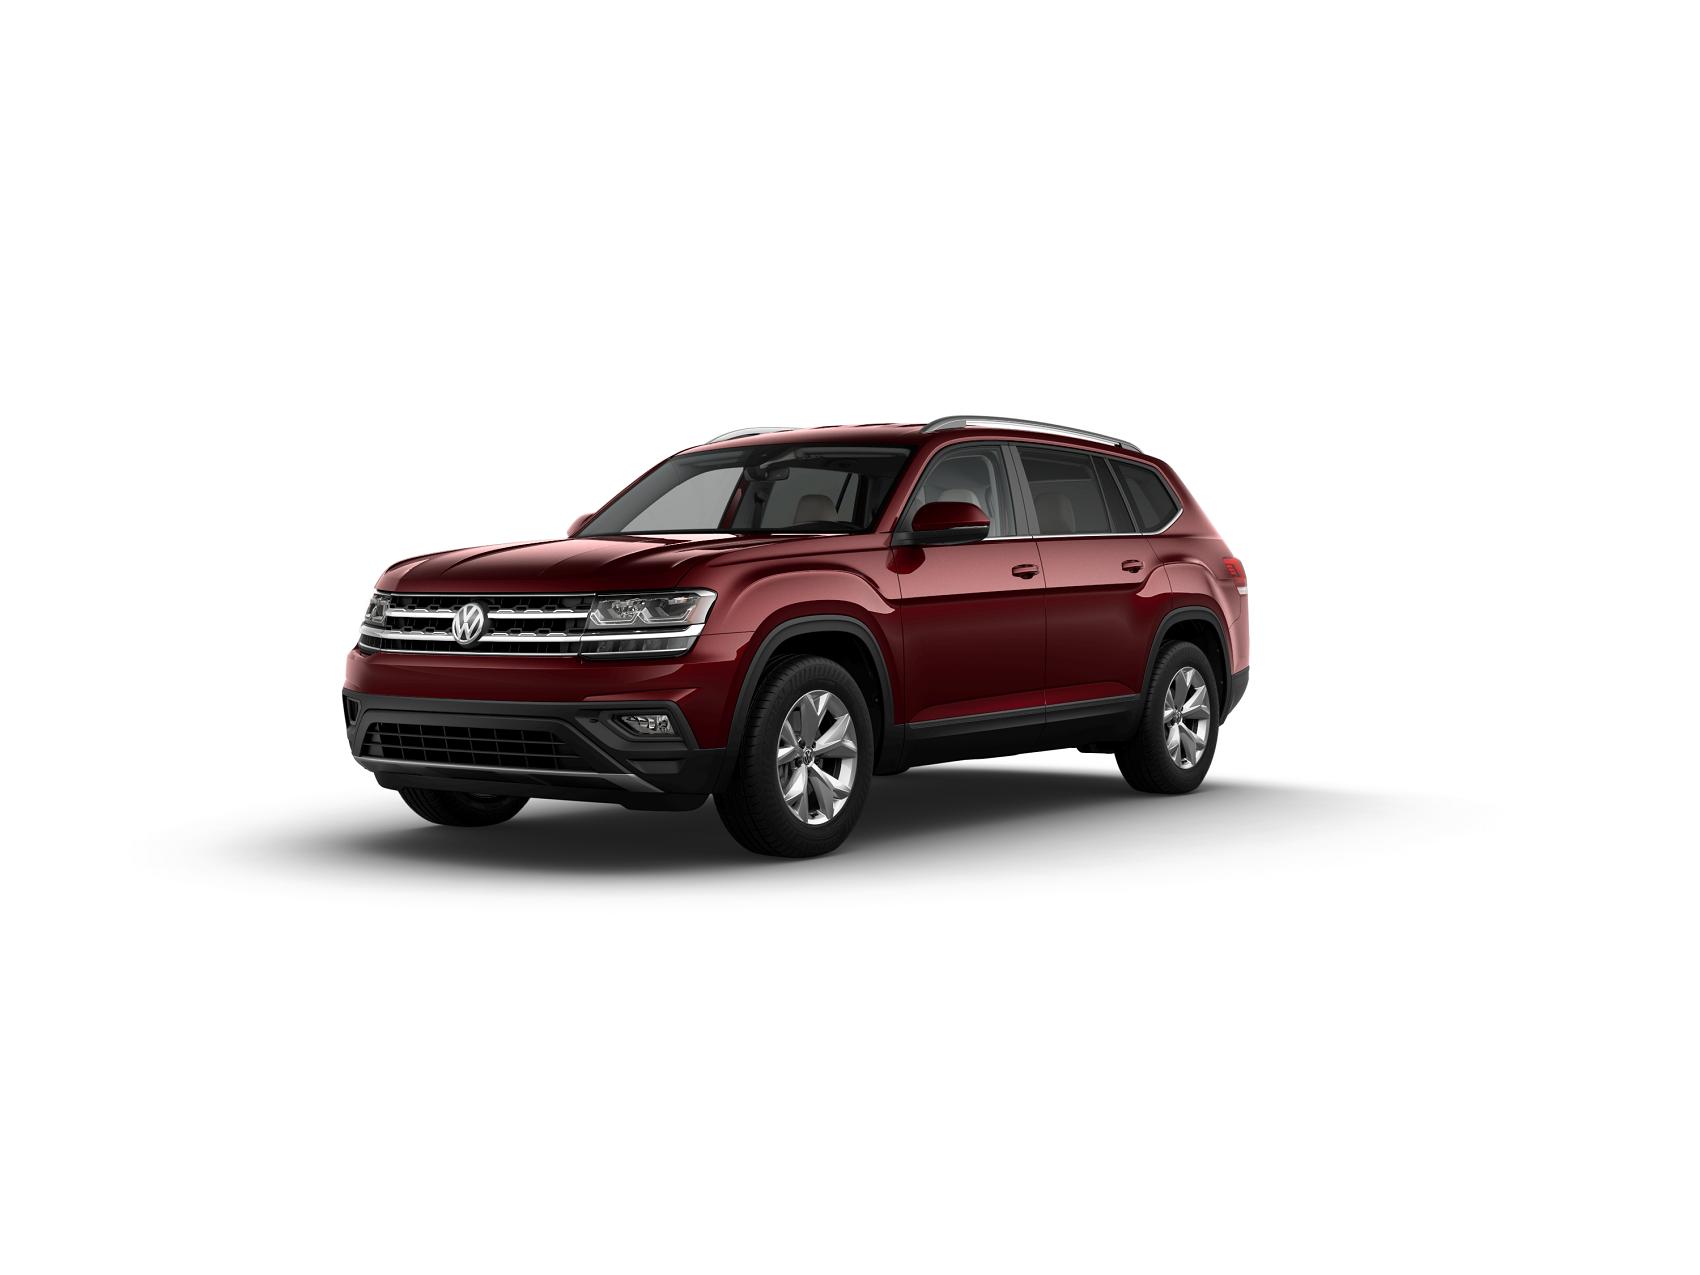 2019 VW Atlas Fortana Red Metallic